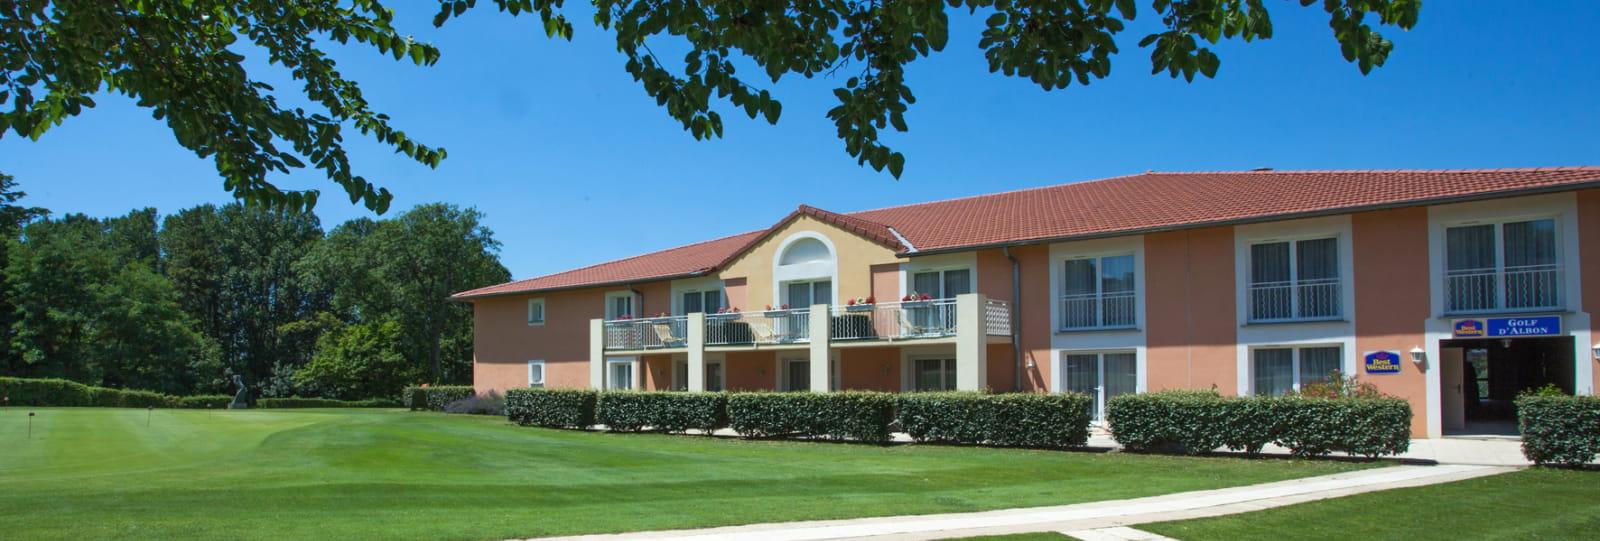 Hôtel best Western golf albon